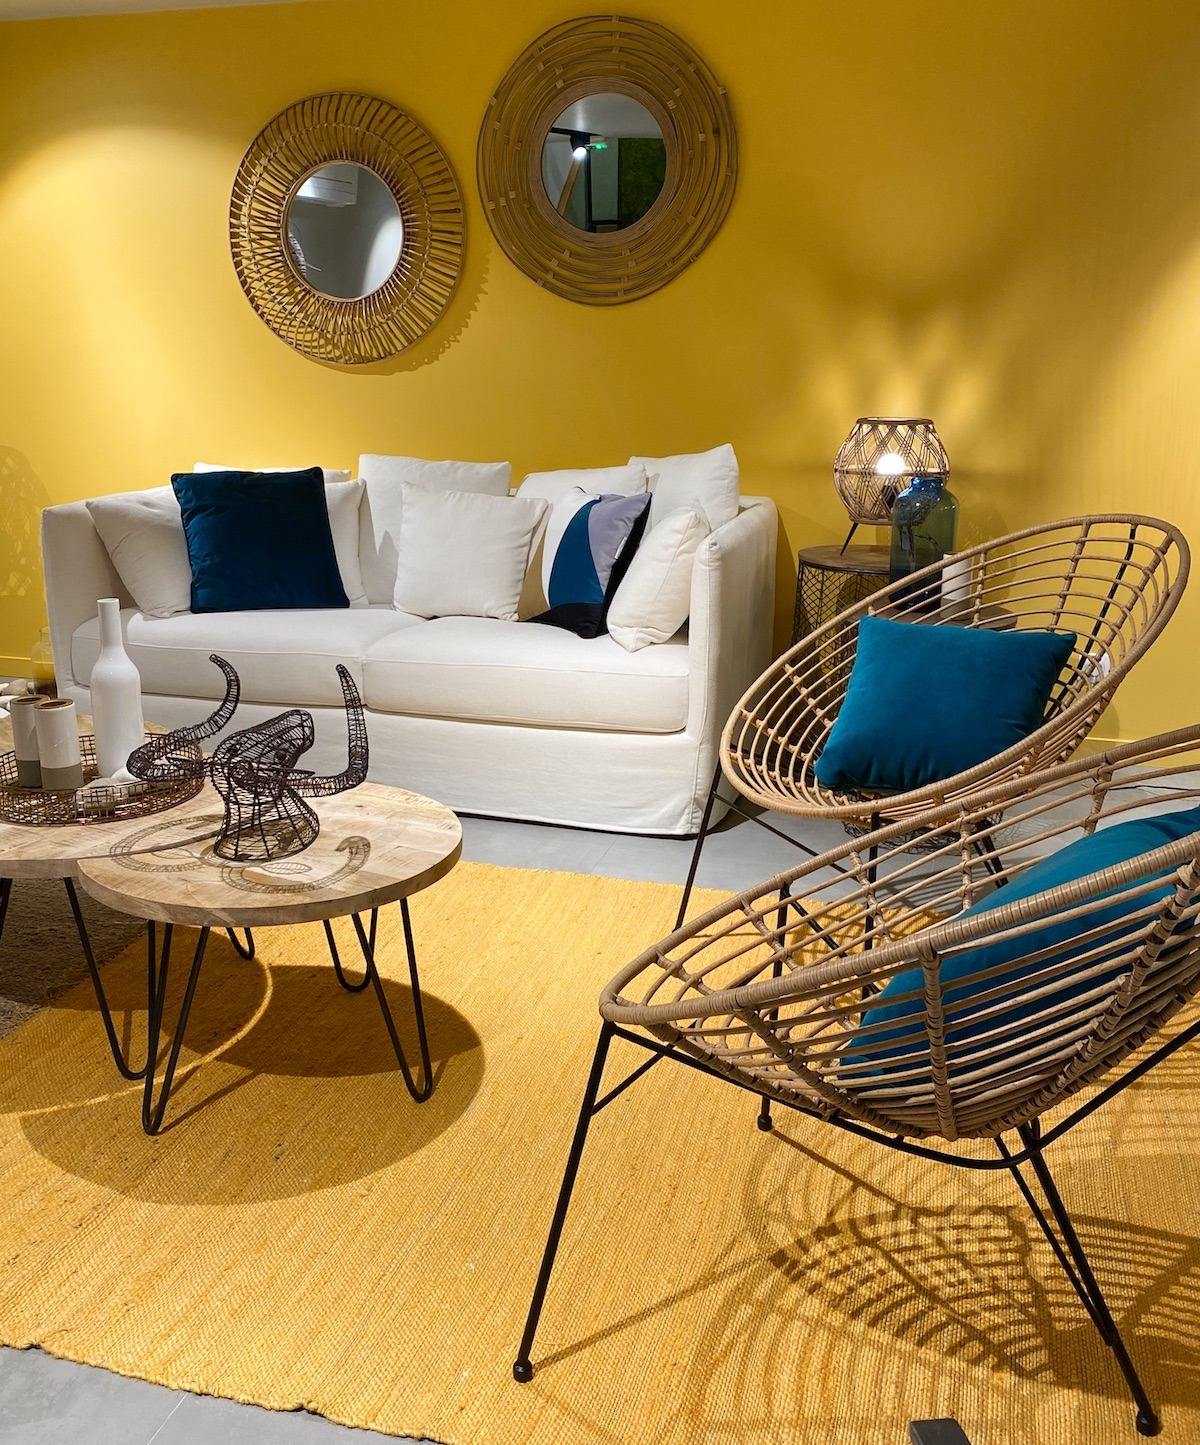 salon jaune moutarde canapé blanc tapis design tressé rotin